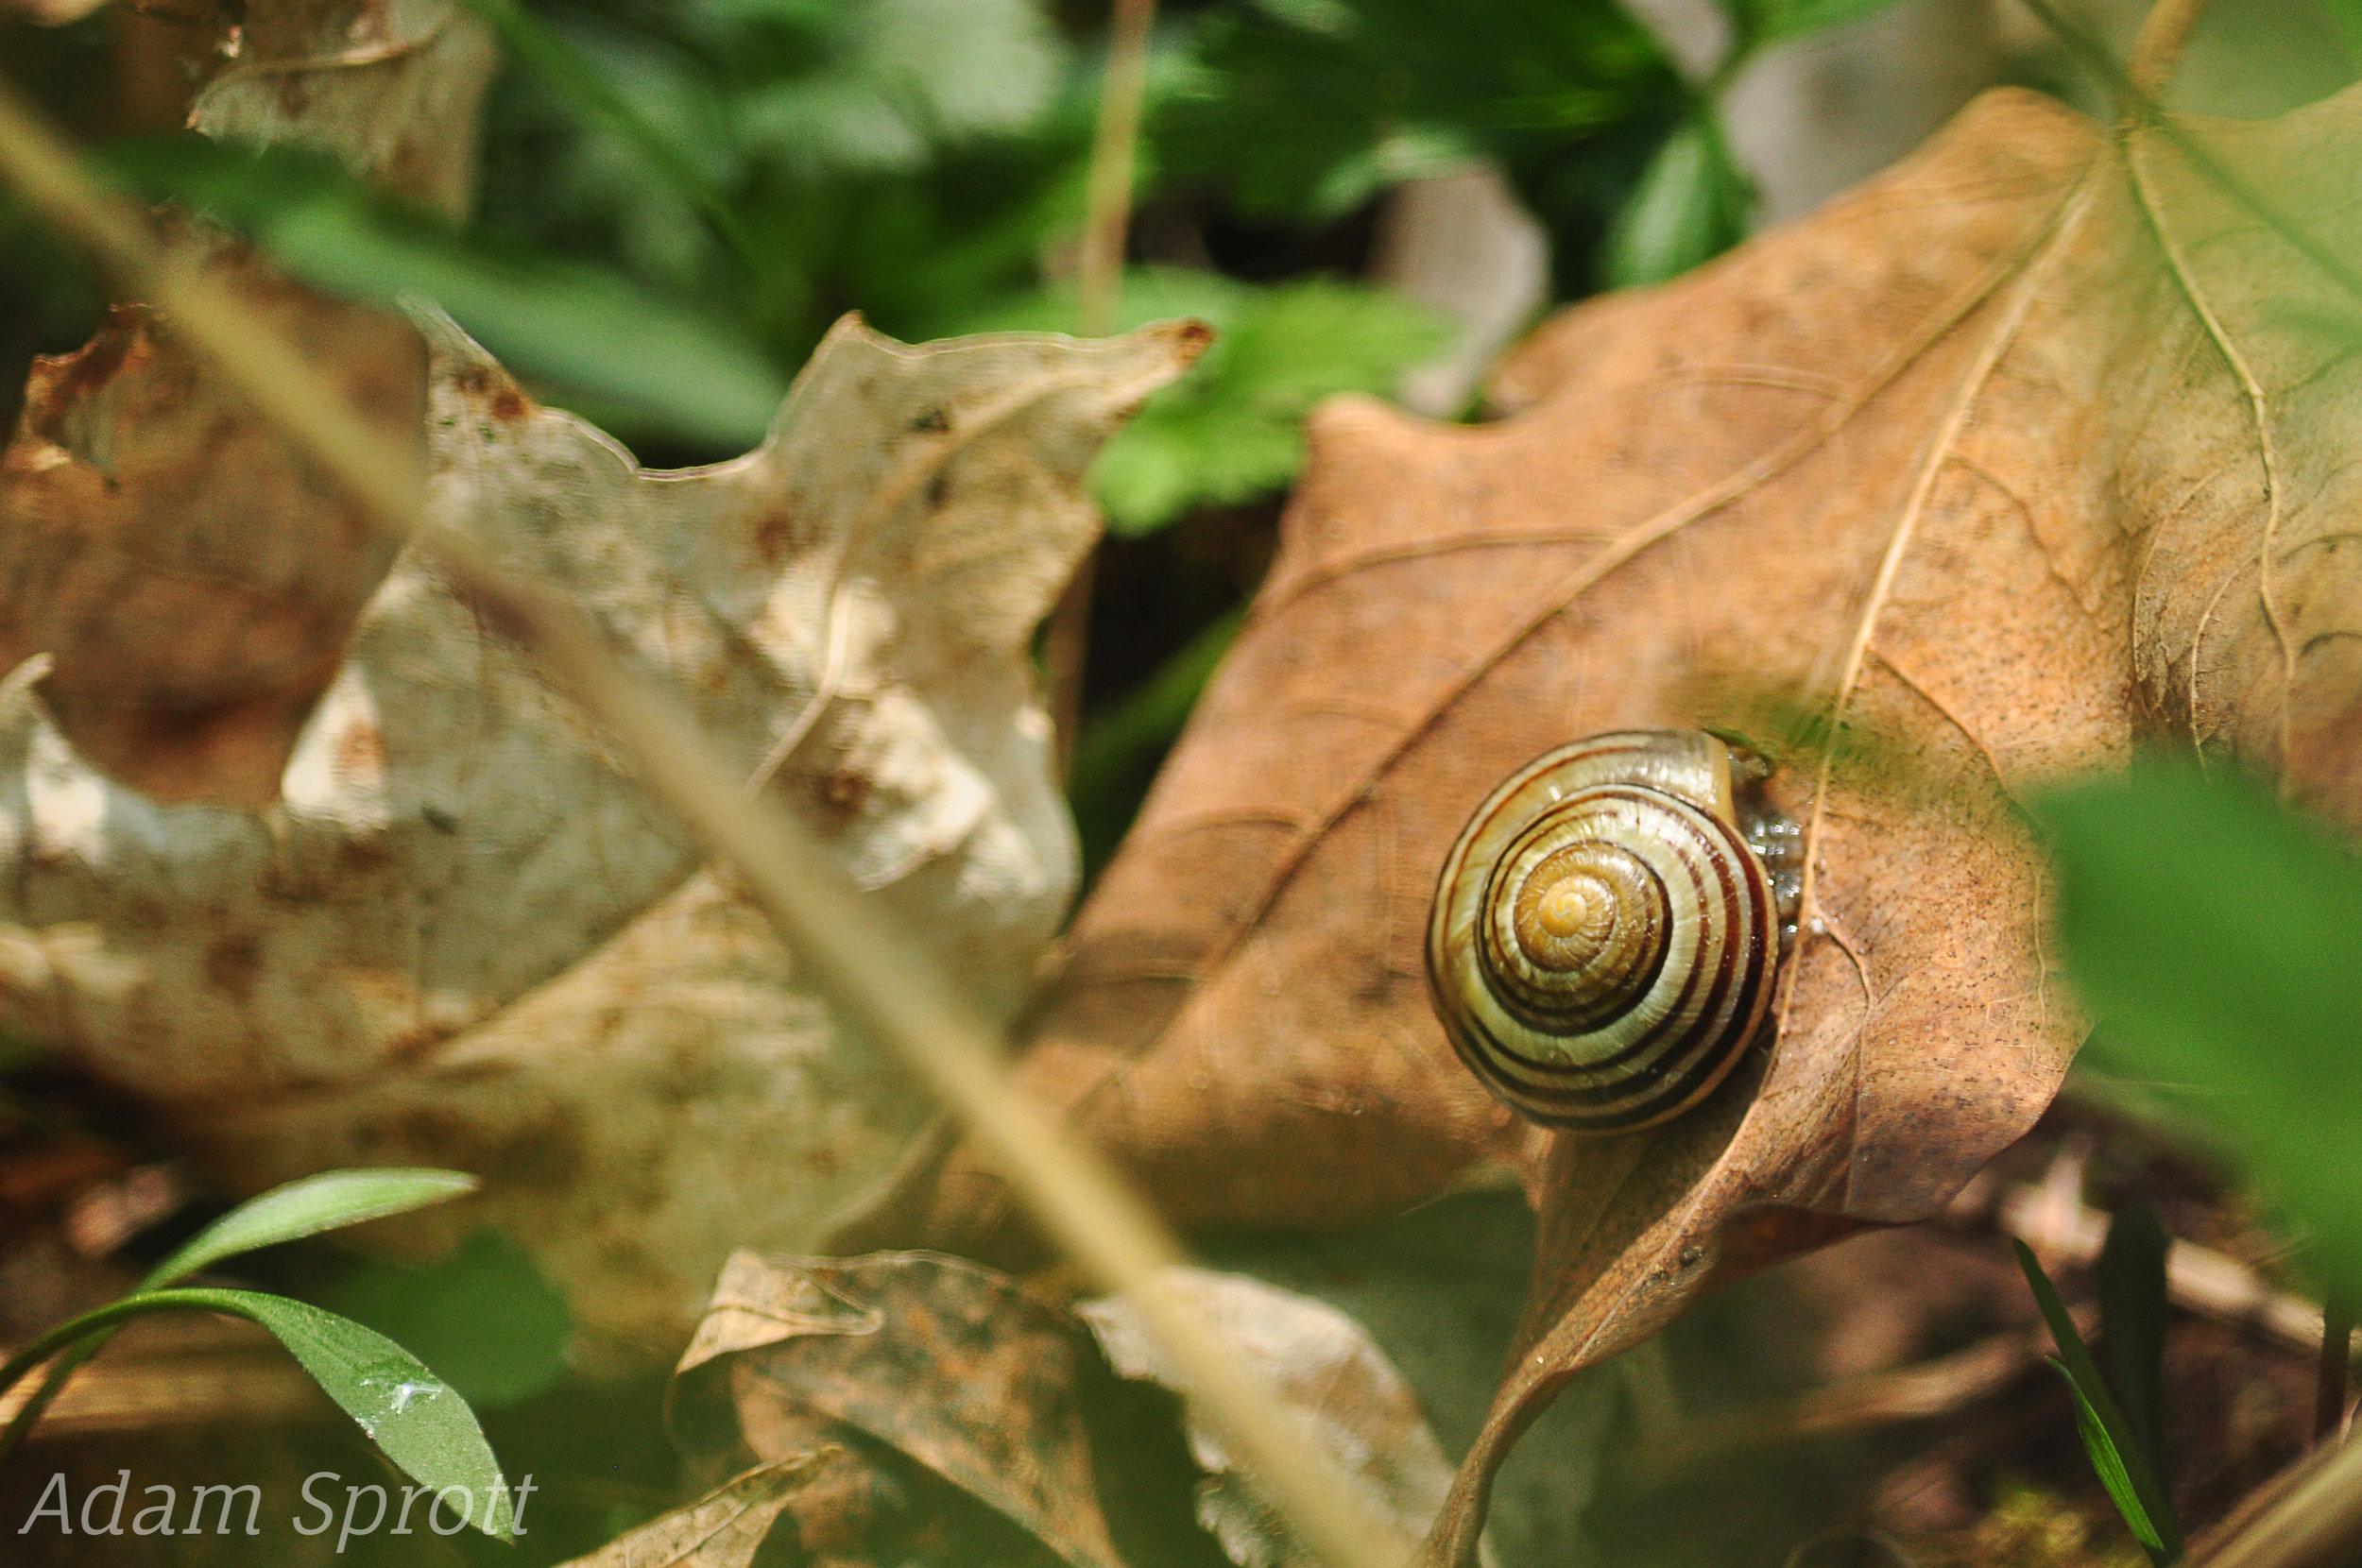 5.6 Mollusca 2 - Grove Snail - Cepaea nemoralis.jpg